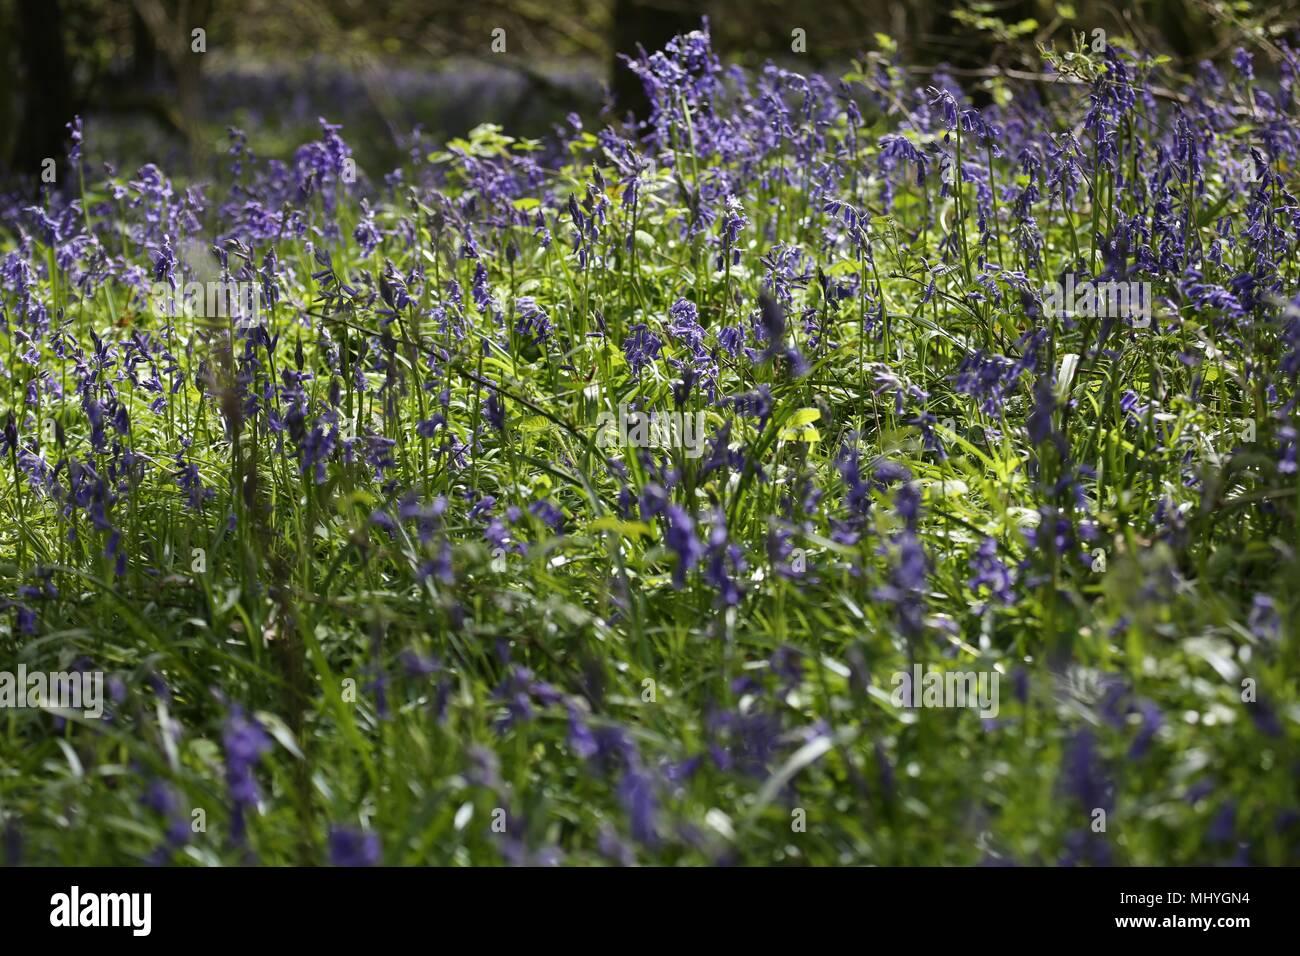 Bluebell Woods, Peasemore Village, Berkshire, England - Stock Image